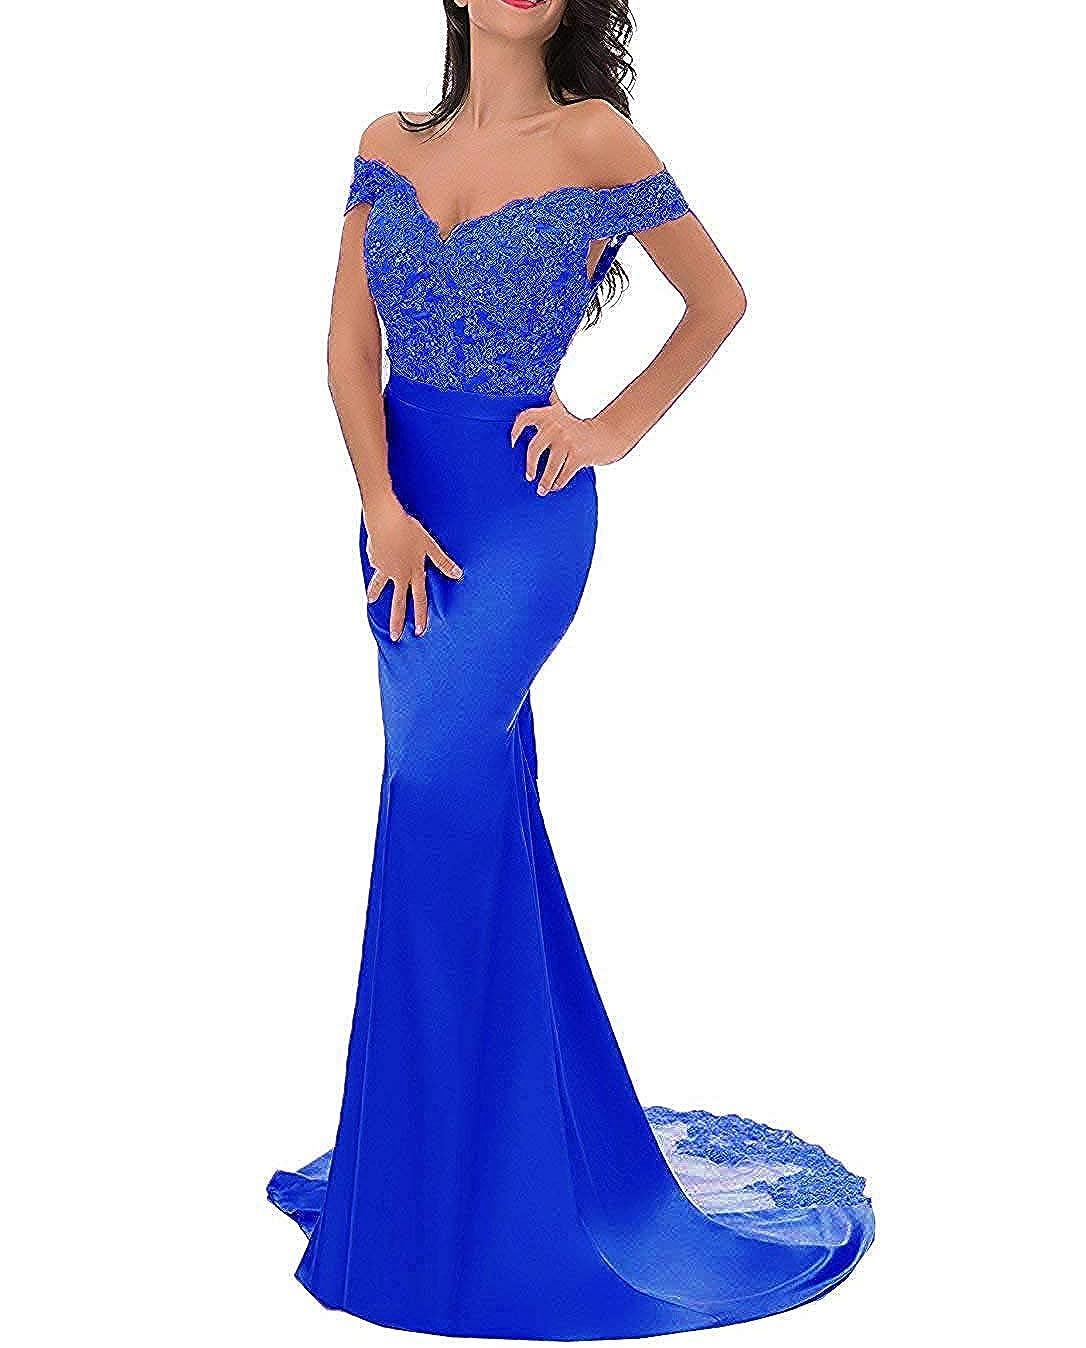 Royal bluee PearlBridal VNeck Off Shoulder Mermaid Bridesmaid Dresses Lace Long Evening Formal Gown